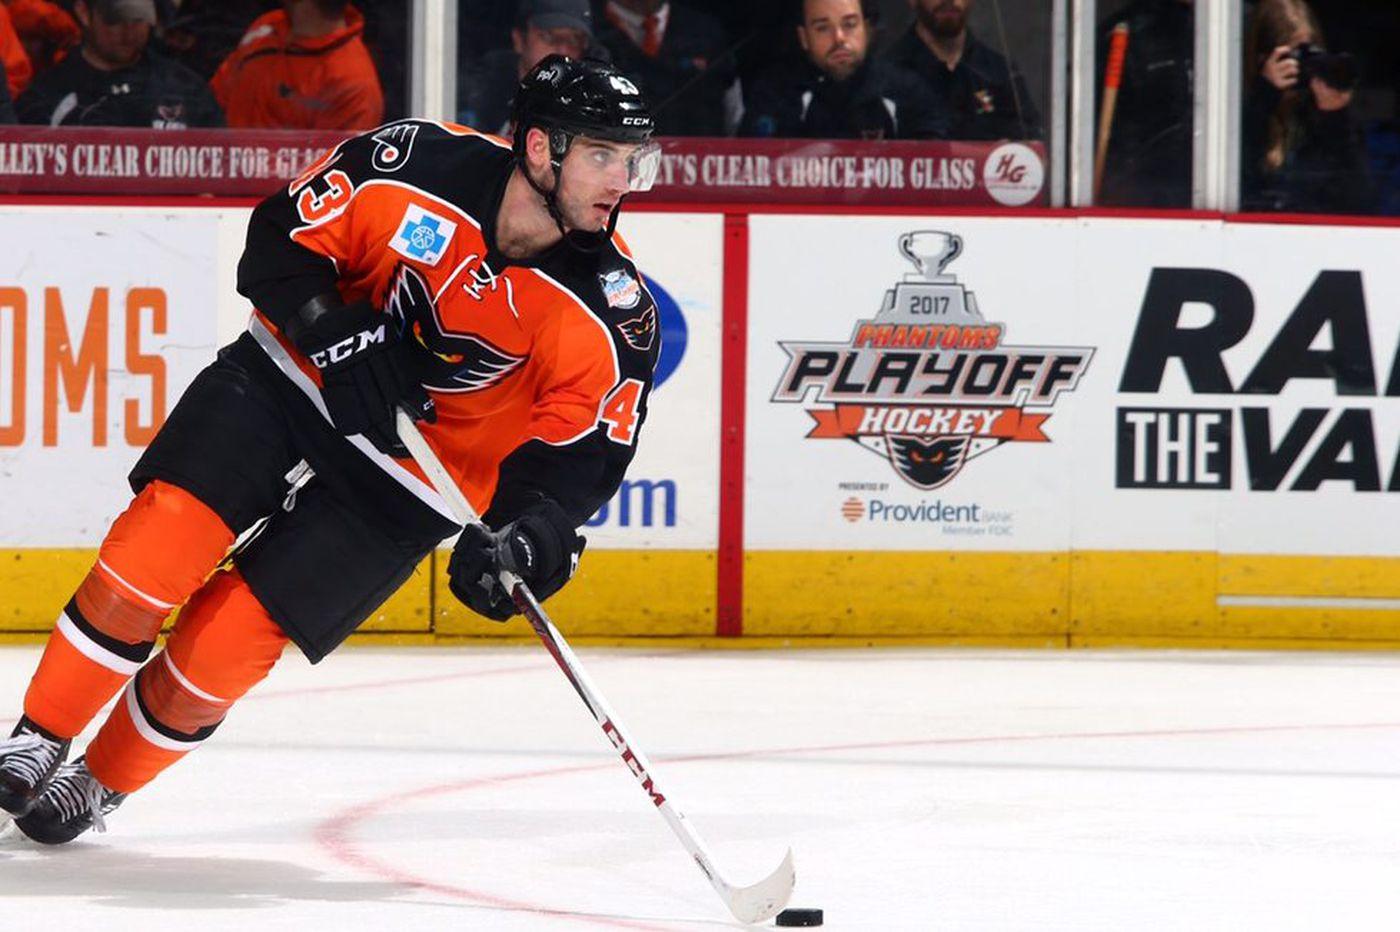 Flyers call up Alex Lyon, T.J. Brennan to replace Michal Neuvirth, Brandon Manning